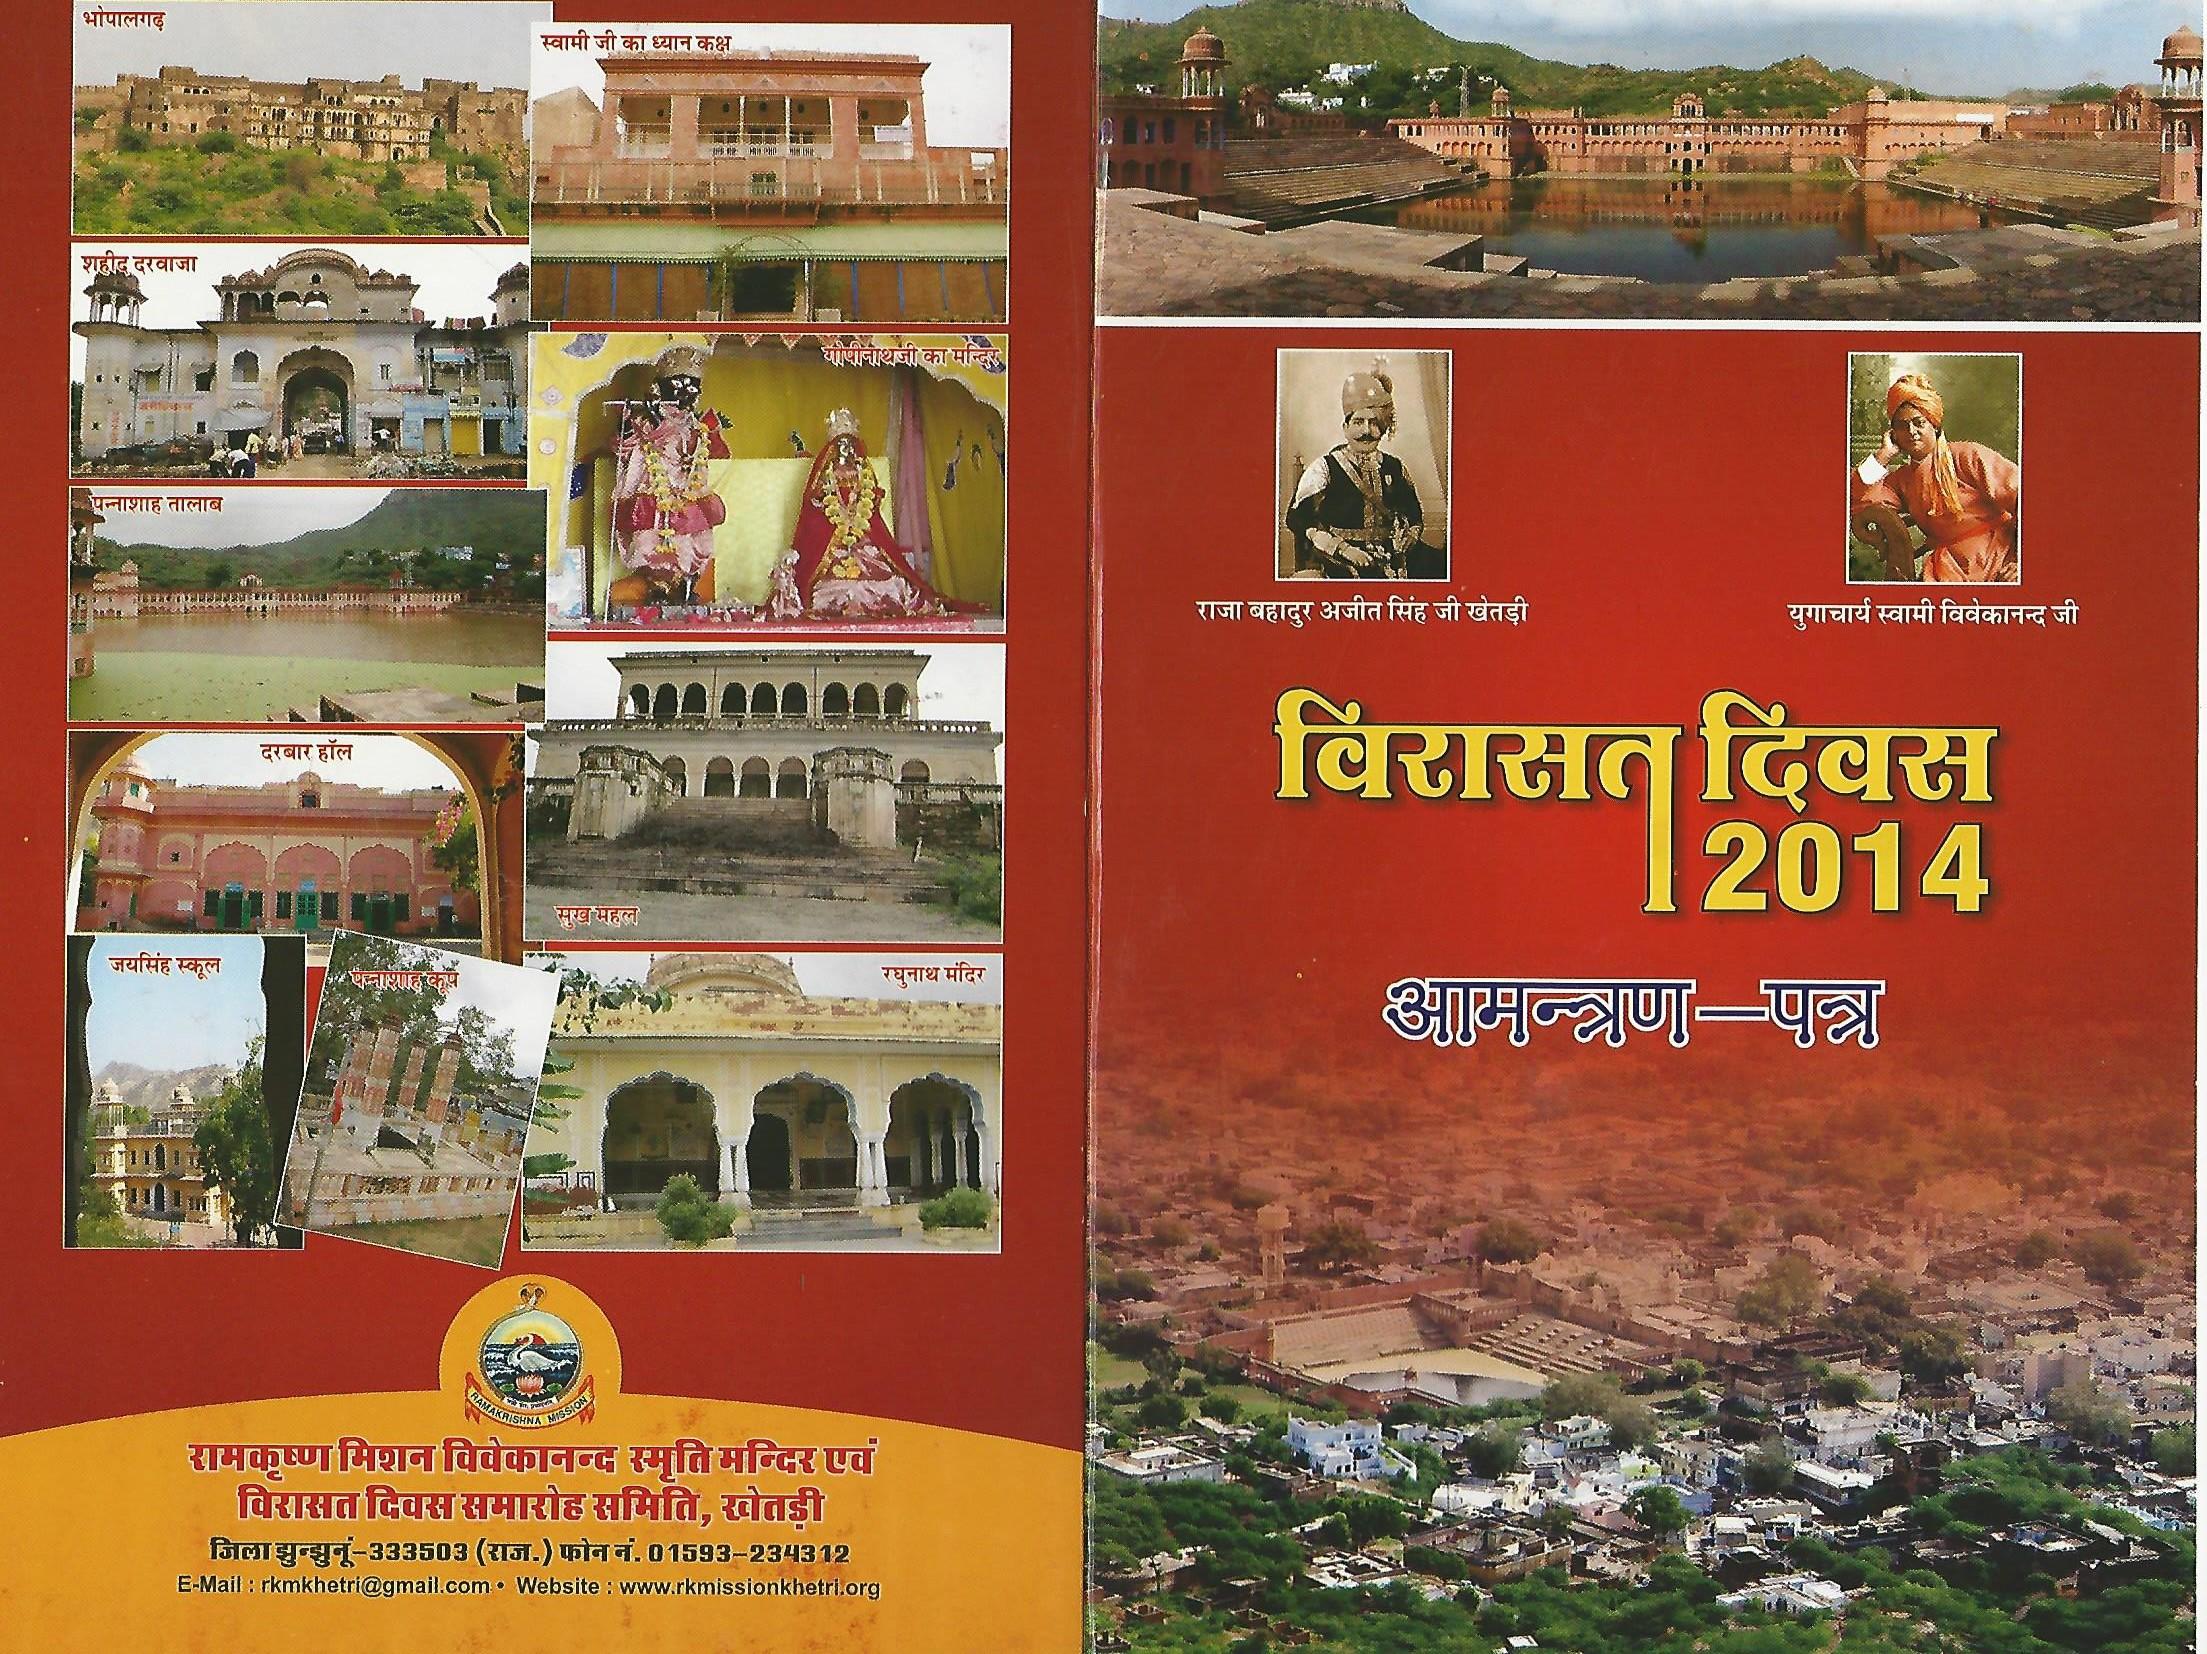 Invitation Letter Of Virasat Diaws Thakur Maa And